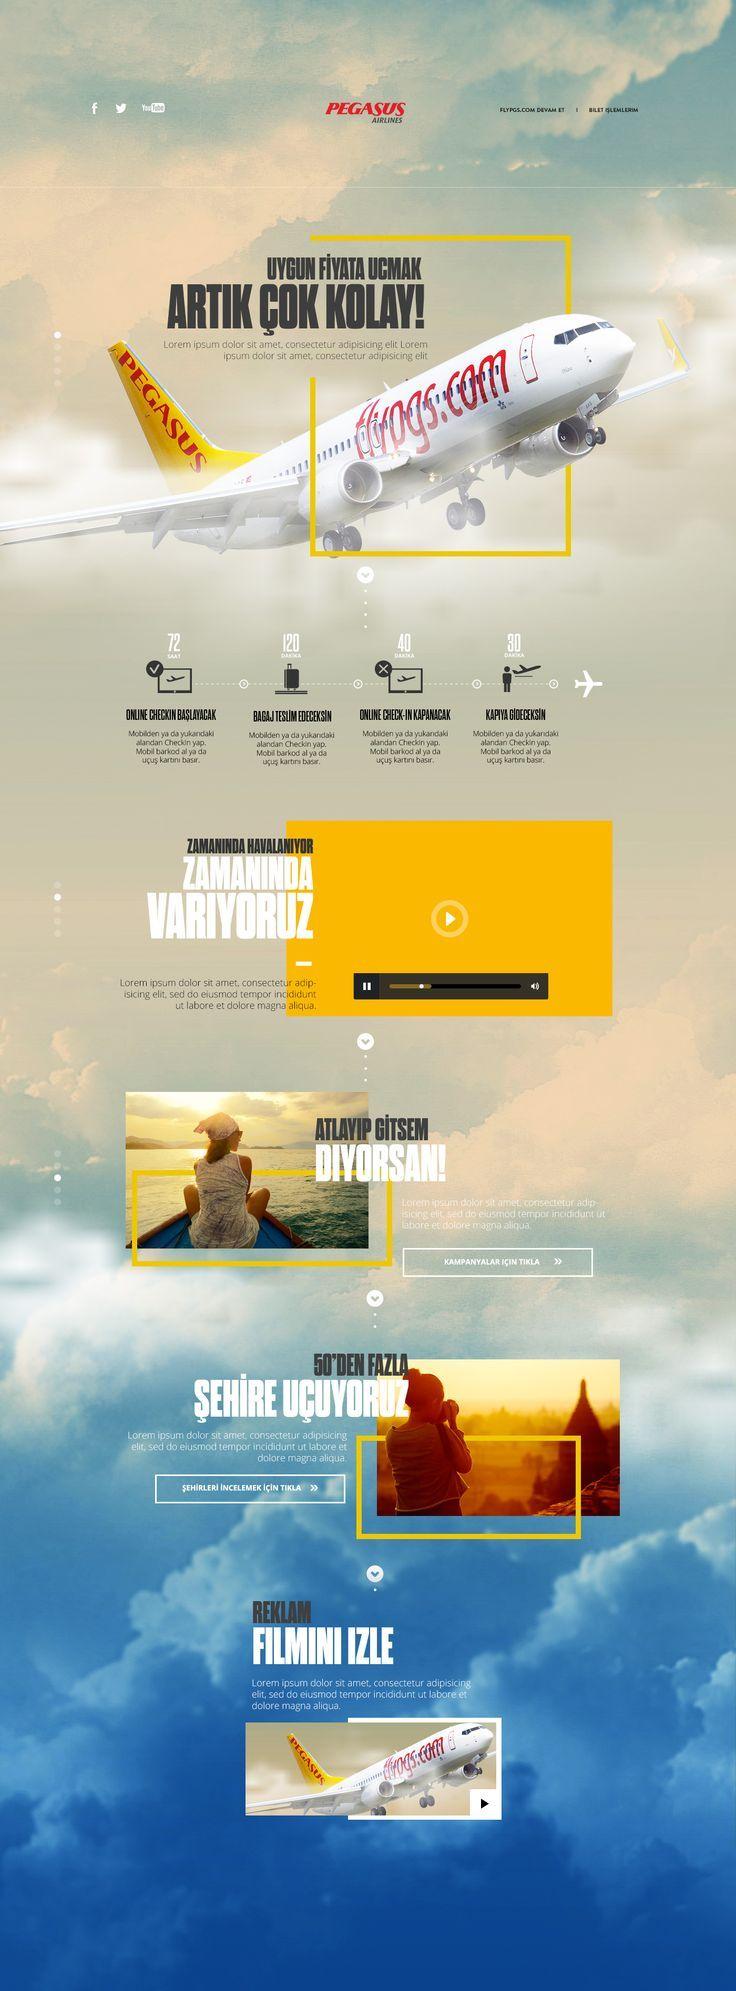 Landing Page user interface design concept for Pegasus on Behance